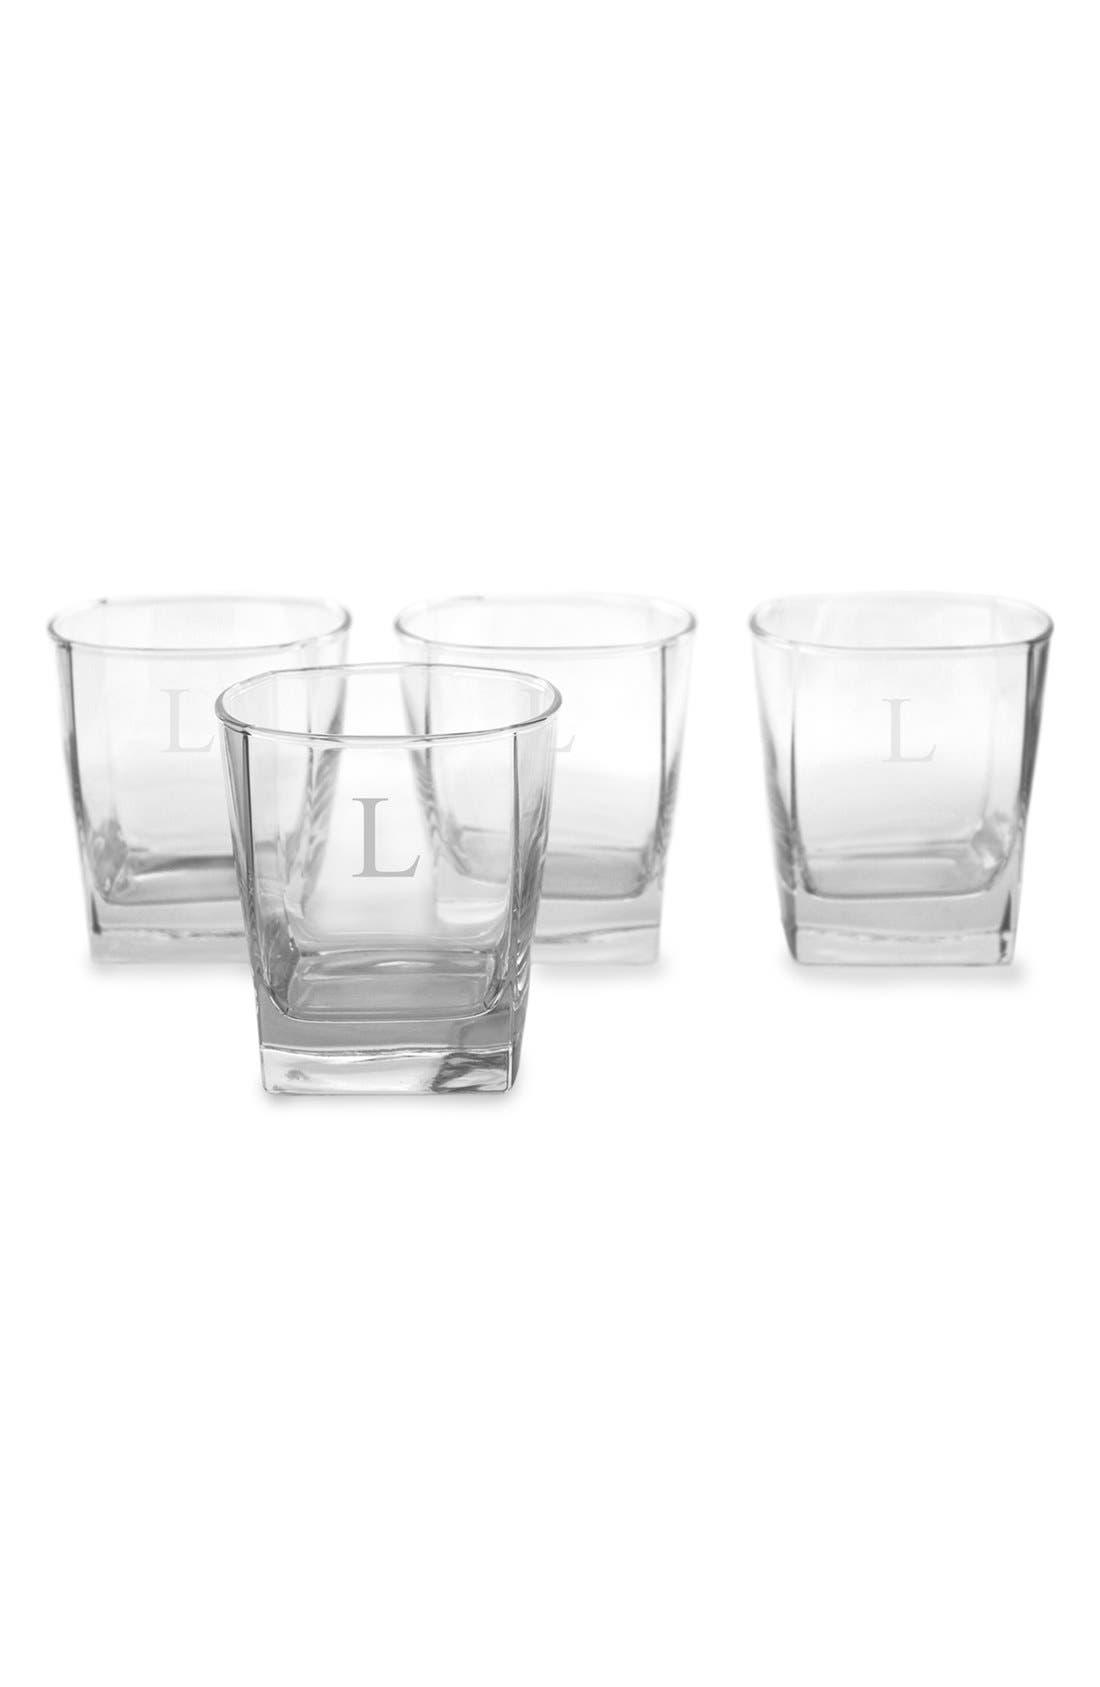 Main Image - Cathy's Concepts Monogram Rocks Glasses (Set of 4)